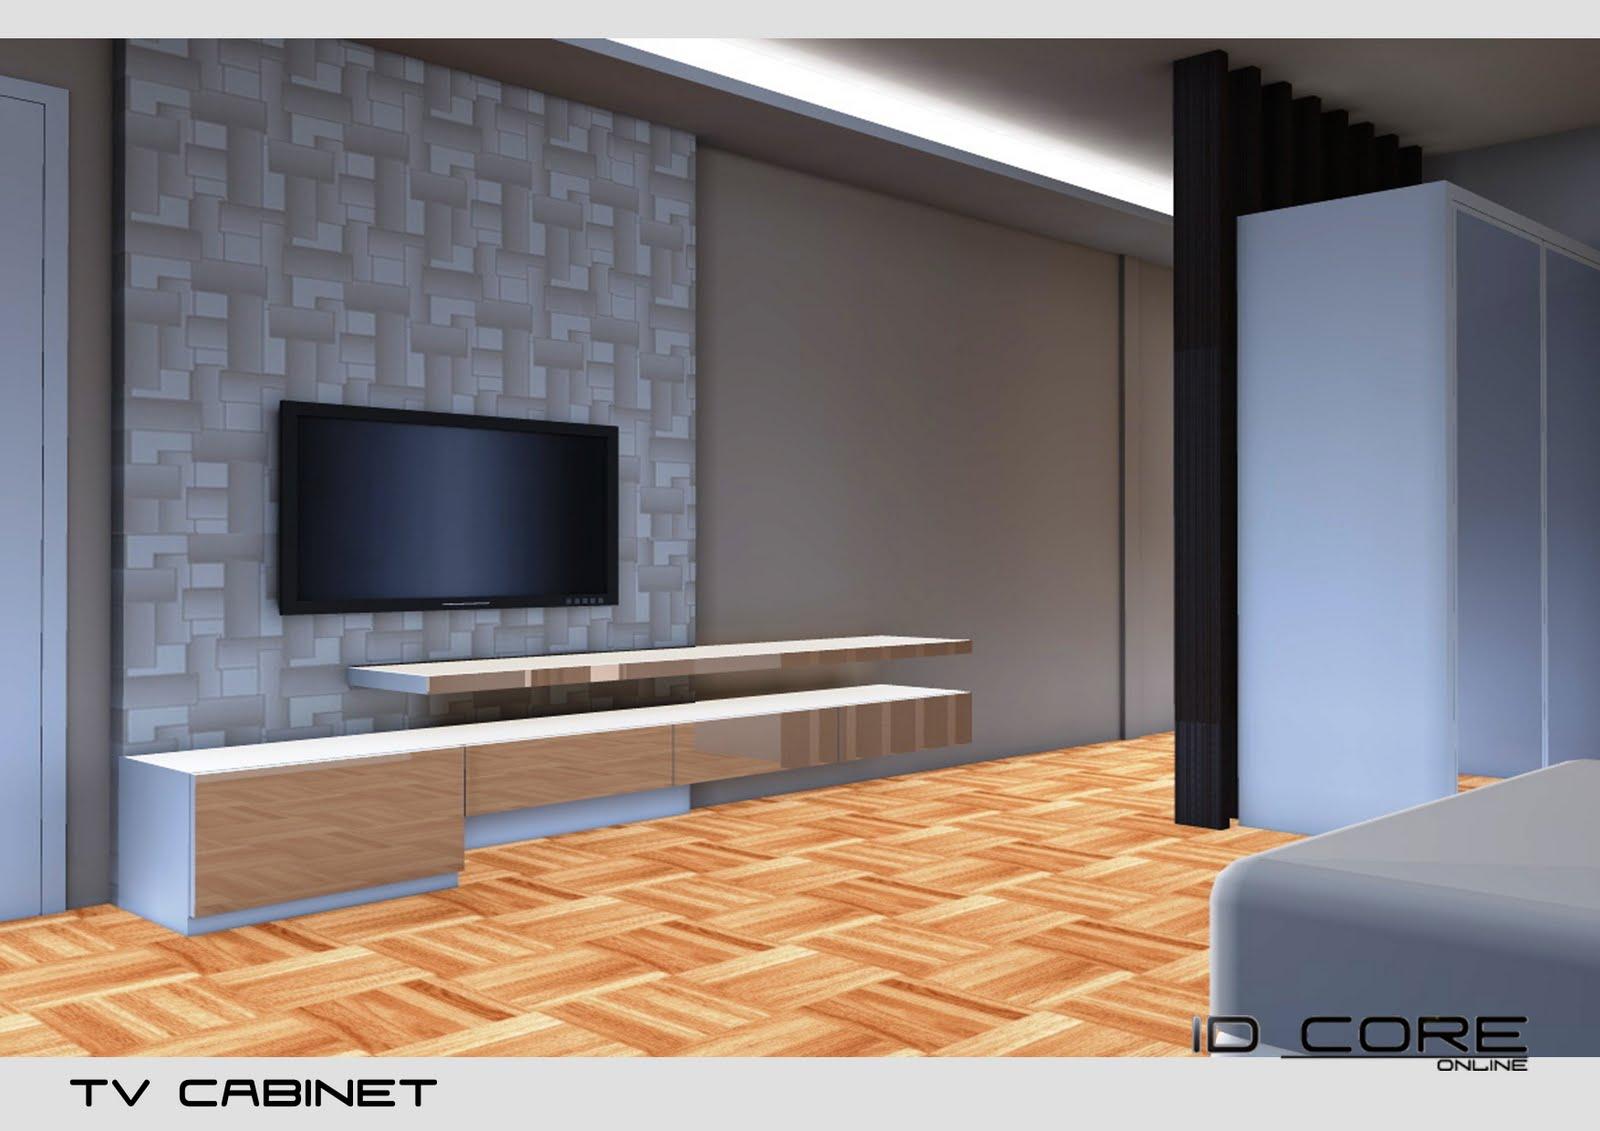 Wallpaper On Laminate Cabinets Wallpapersafari